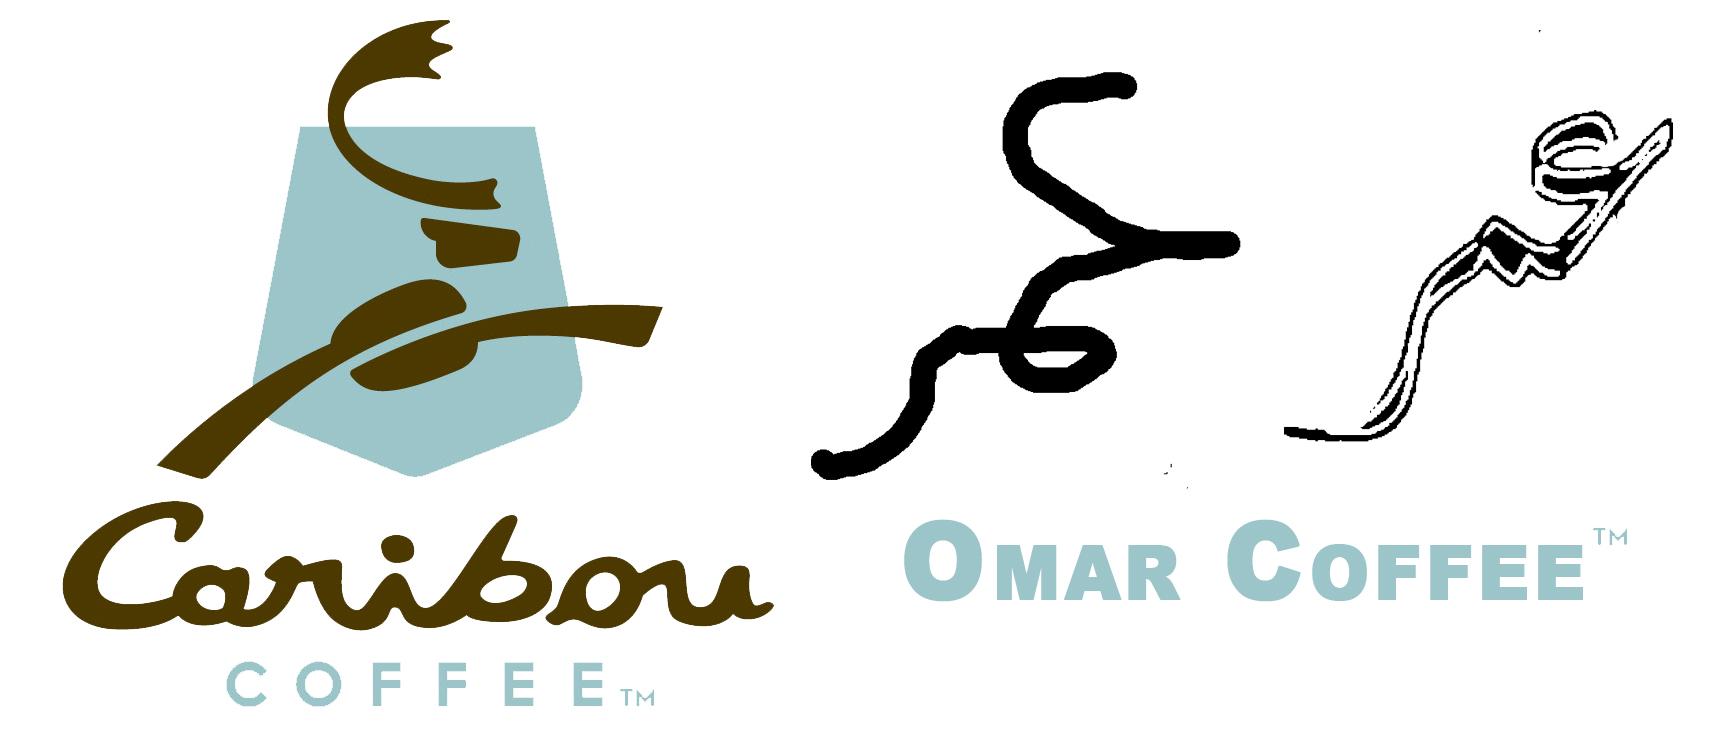 caribou new logo omar in arabic the od